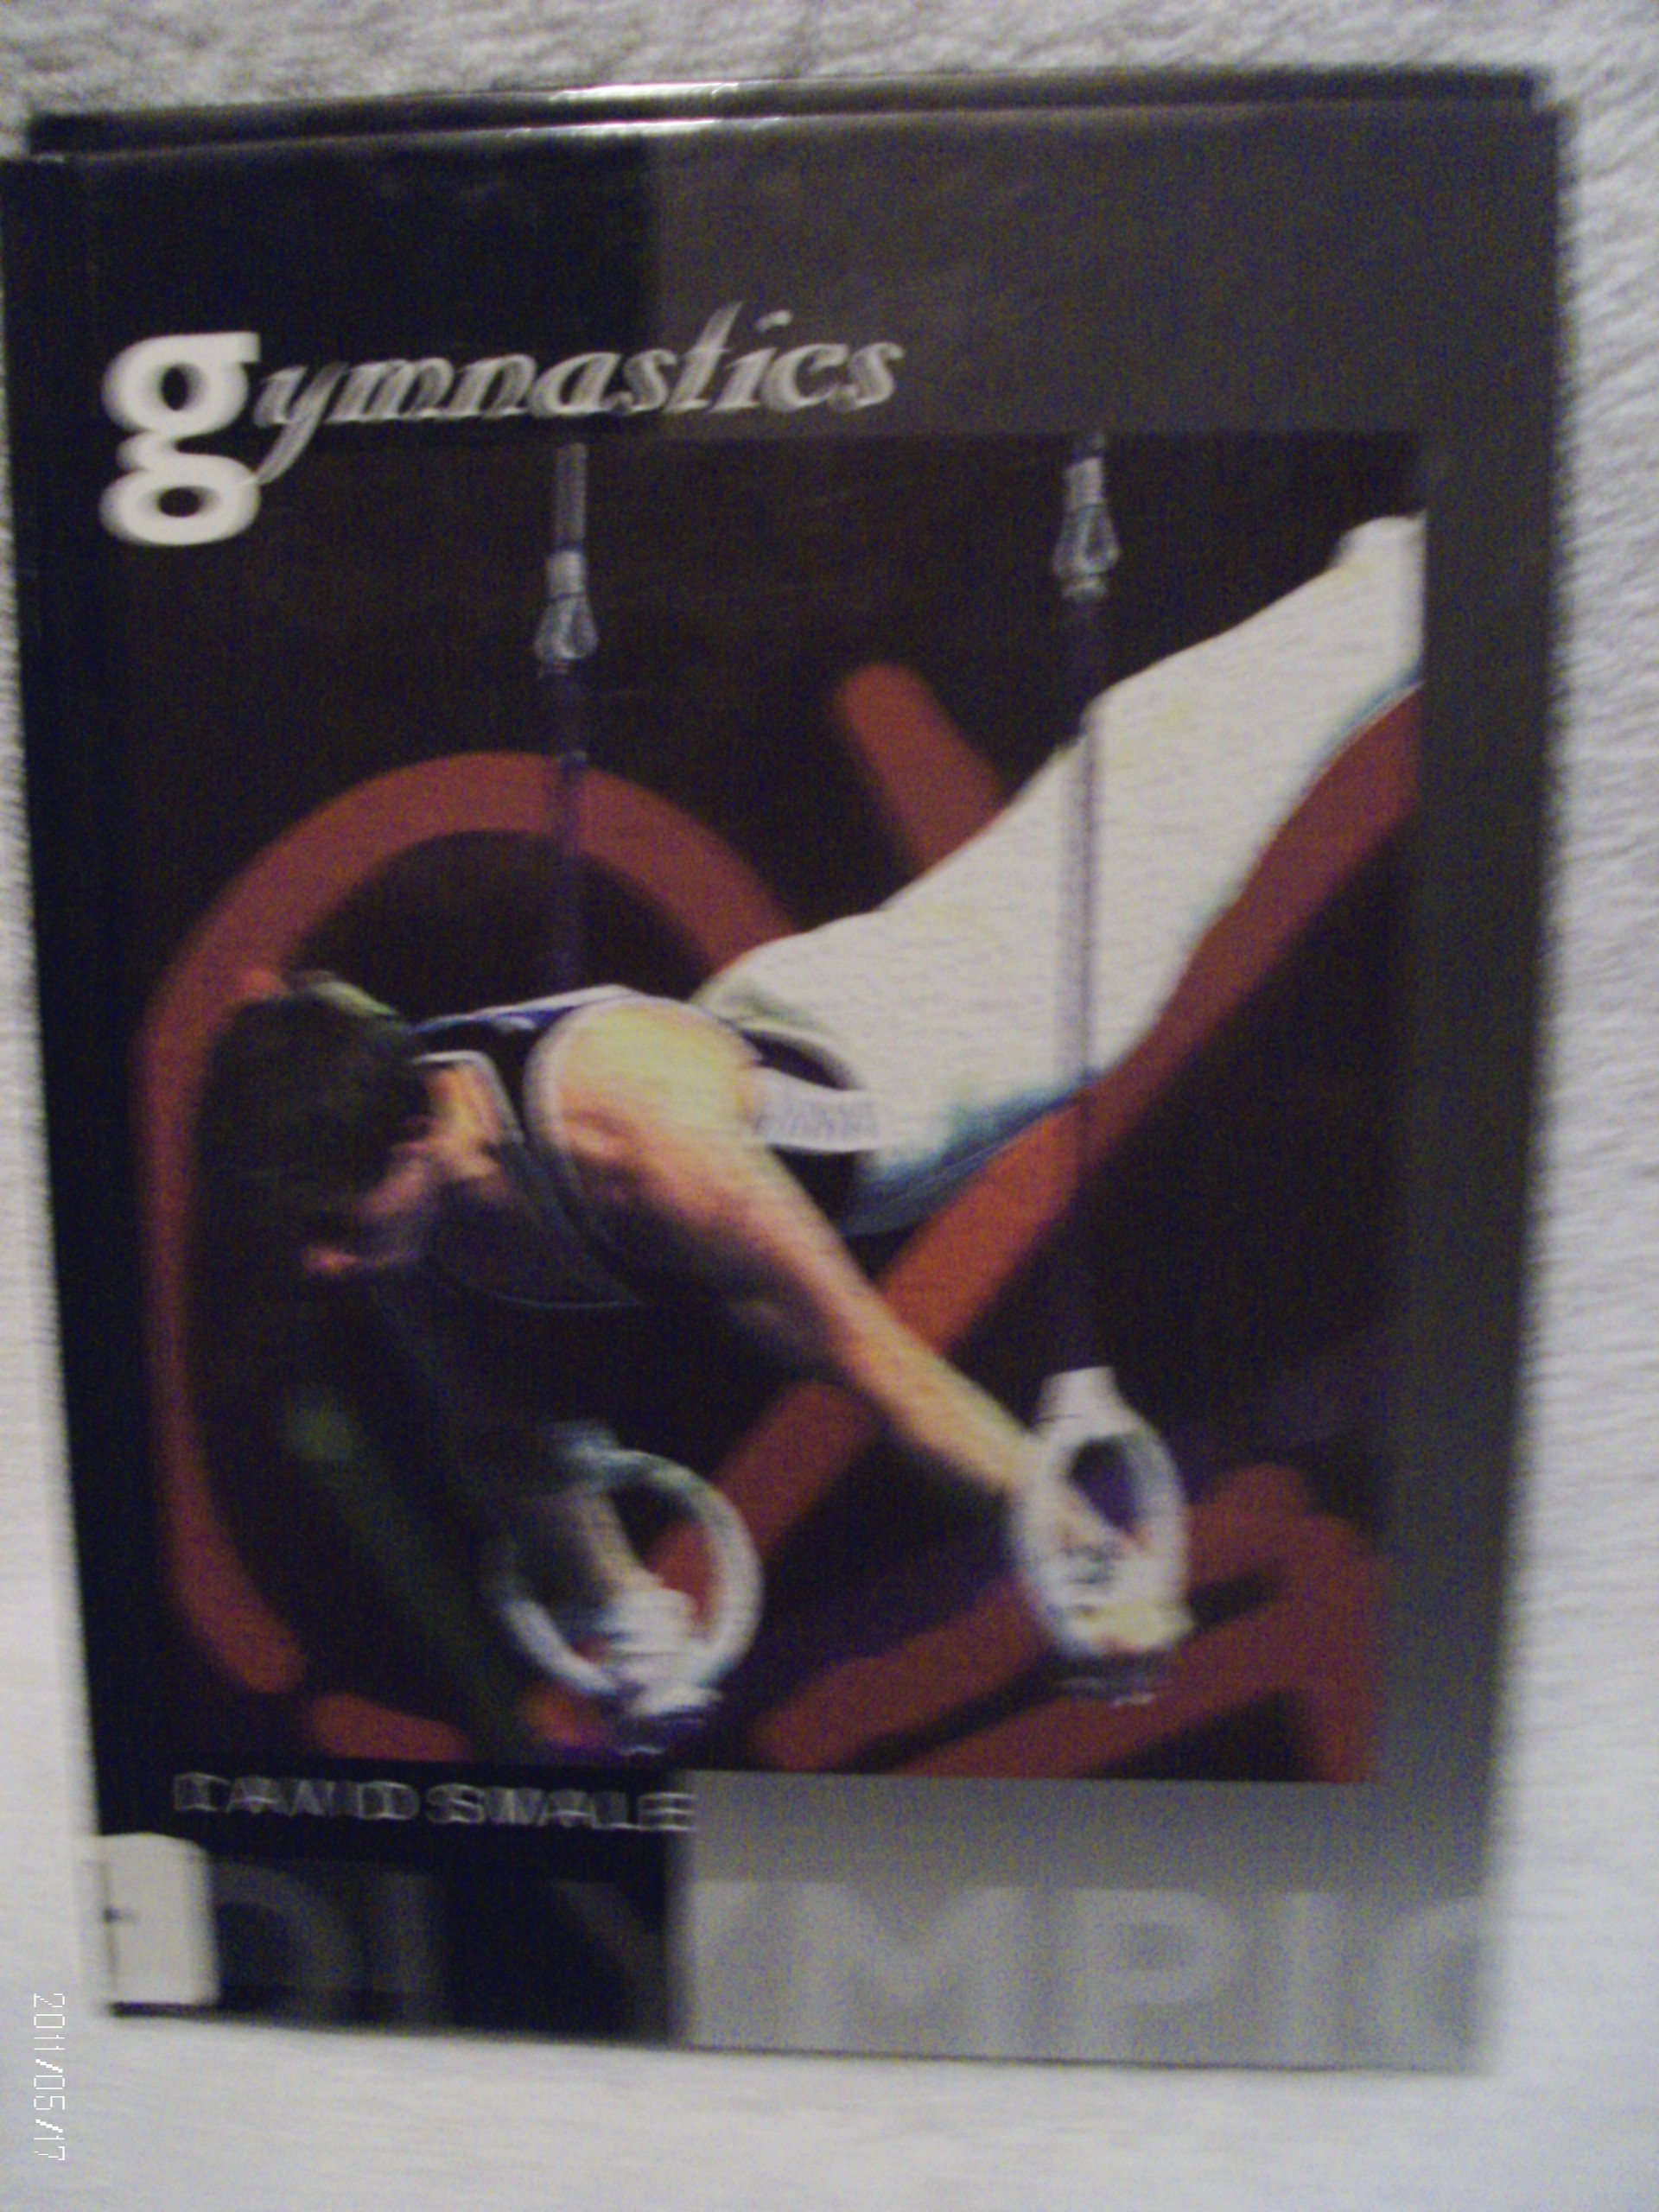 Gymnastics (The Summer Olympics)